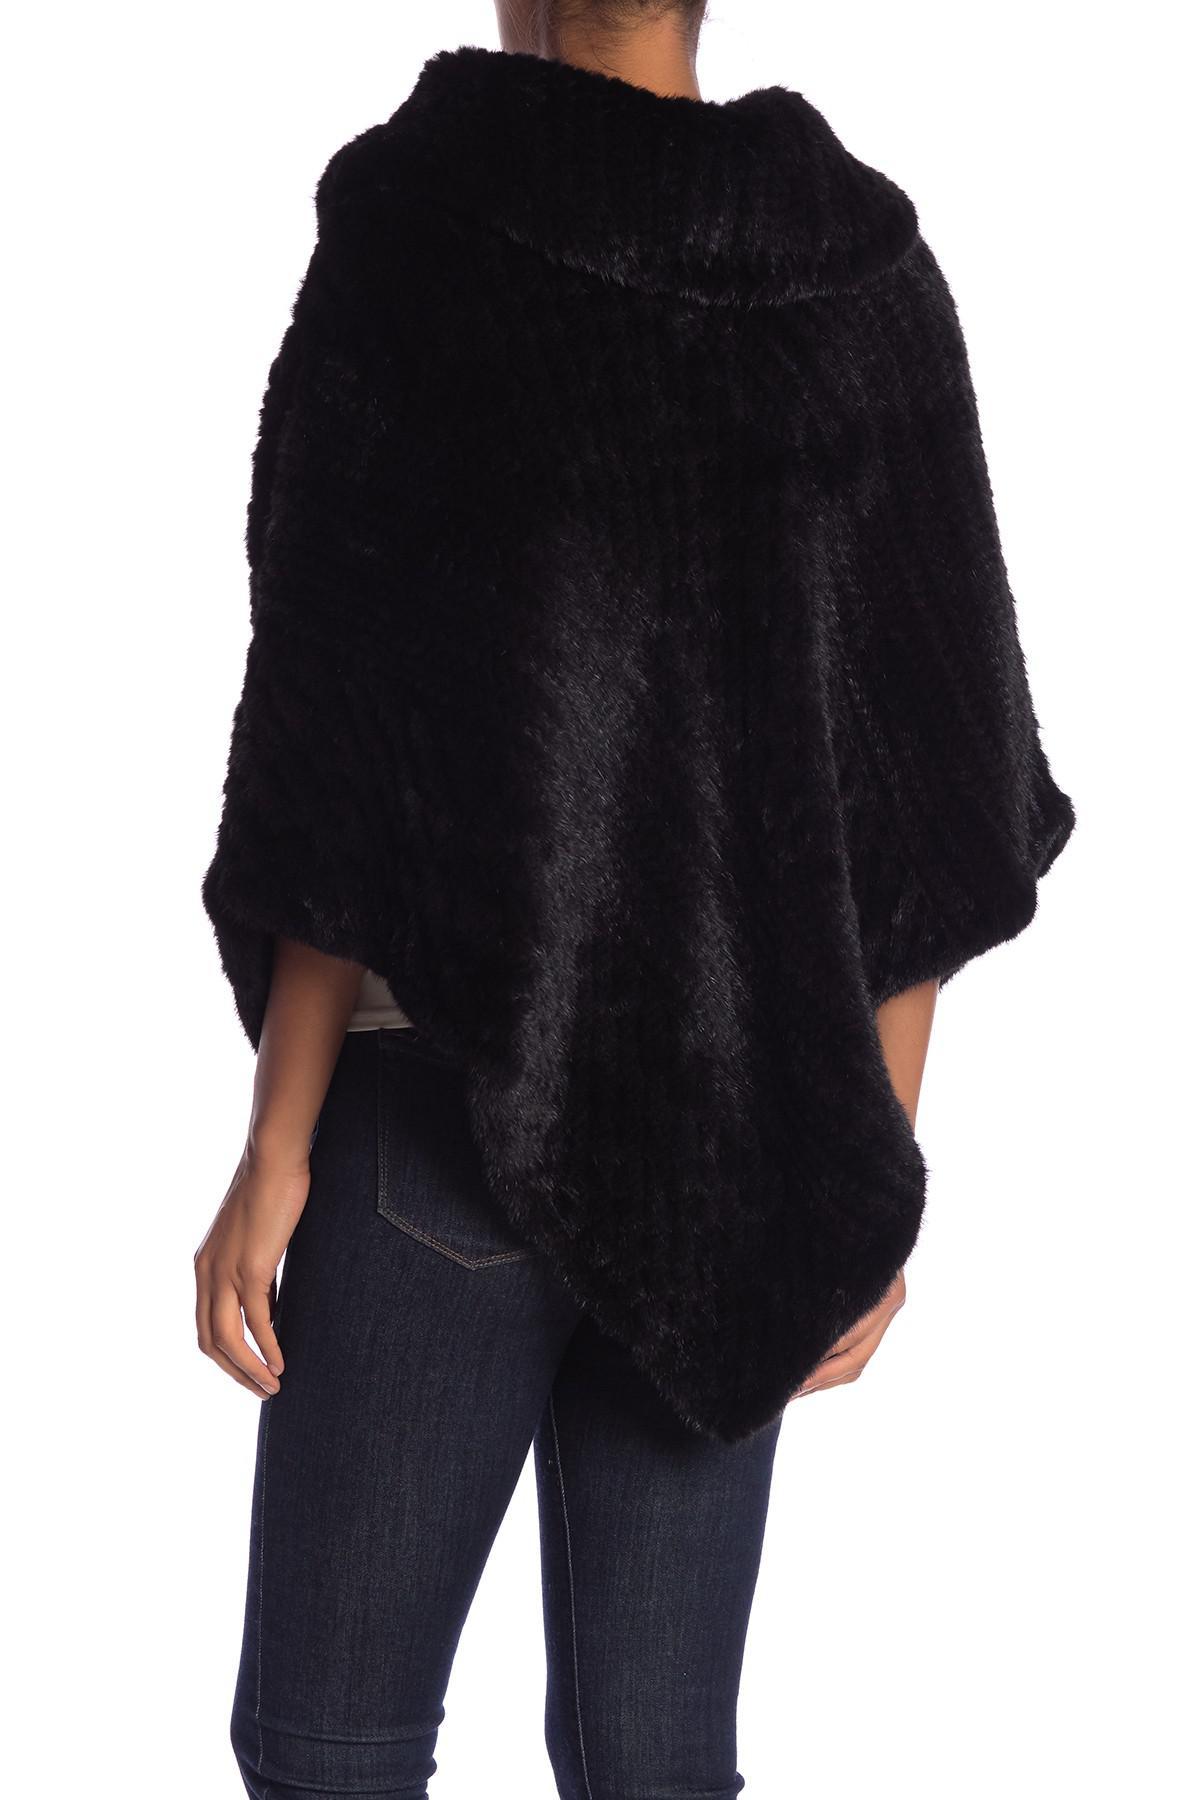 7d78ab1cc Lyst - La Fiorentina Genuine Dyed Mink Fur Poncho in Black